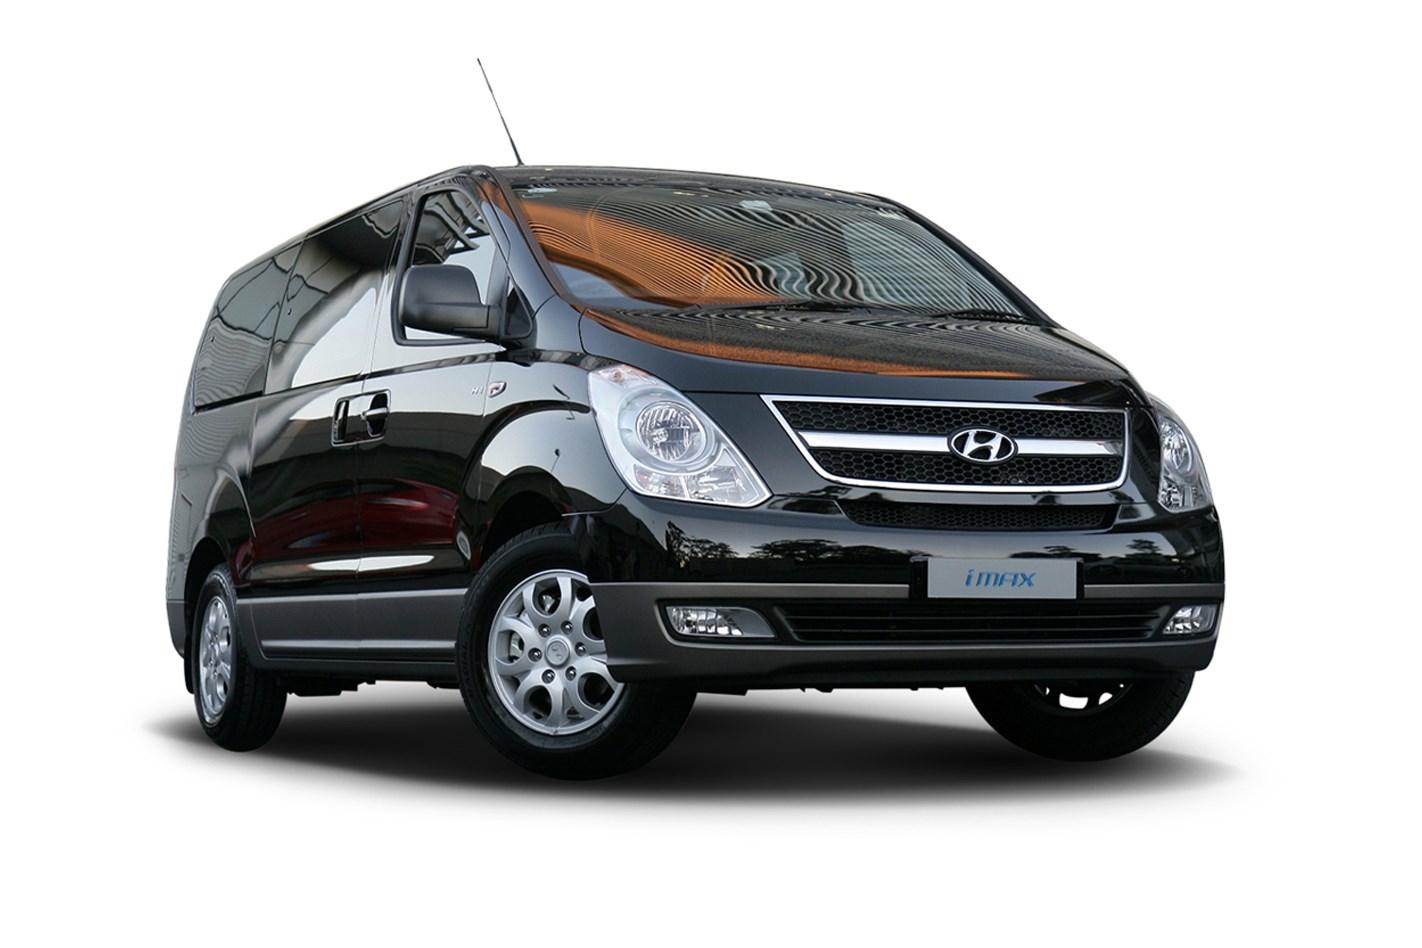 2018 hyundai imax. modren 2018 2015 hyundai imax 4d wagon in 2018 hyundai imax